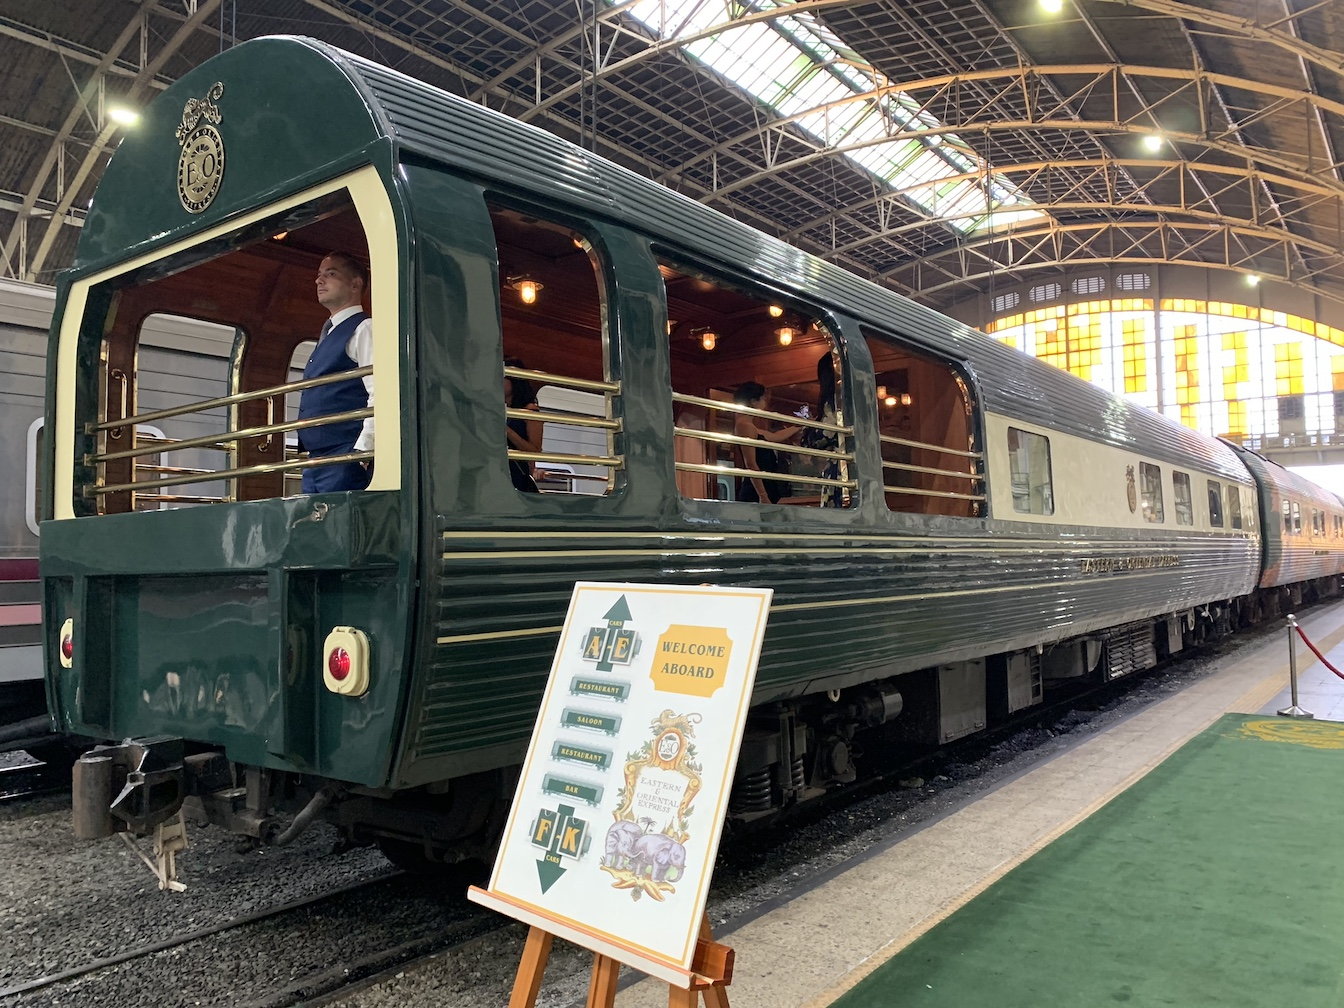 Man on platform in station Eastern & Oriental Express